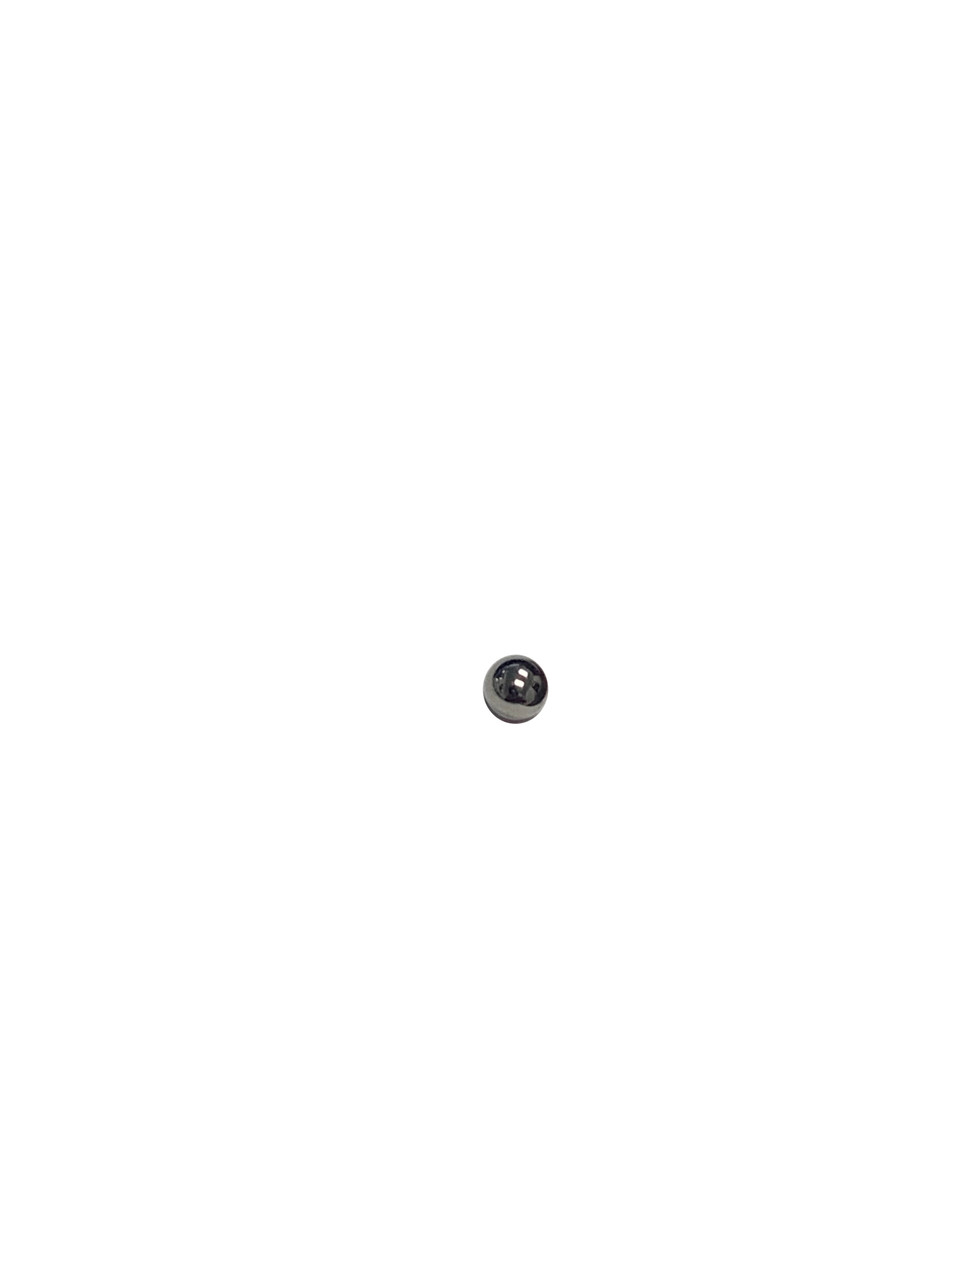 Milwaukee 02-02-0170 Steel Ball 3.5 mm